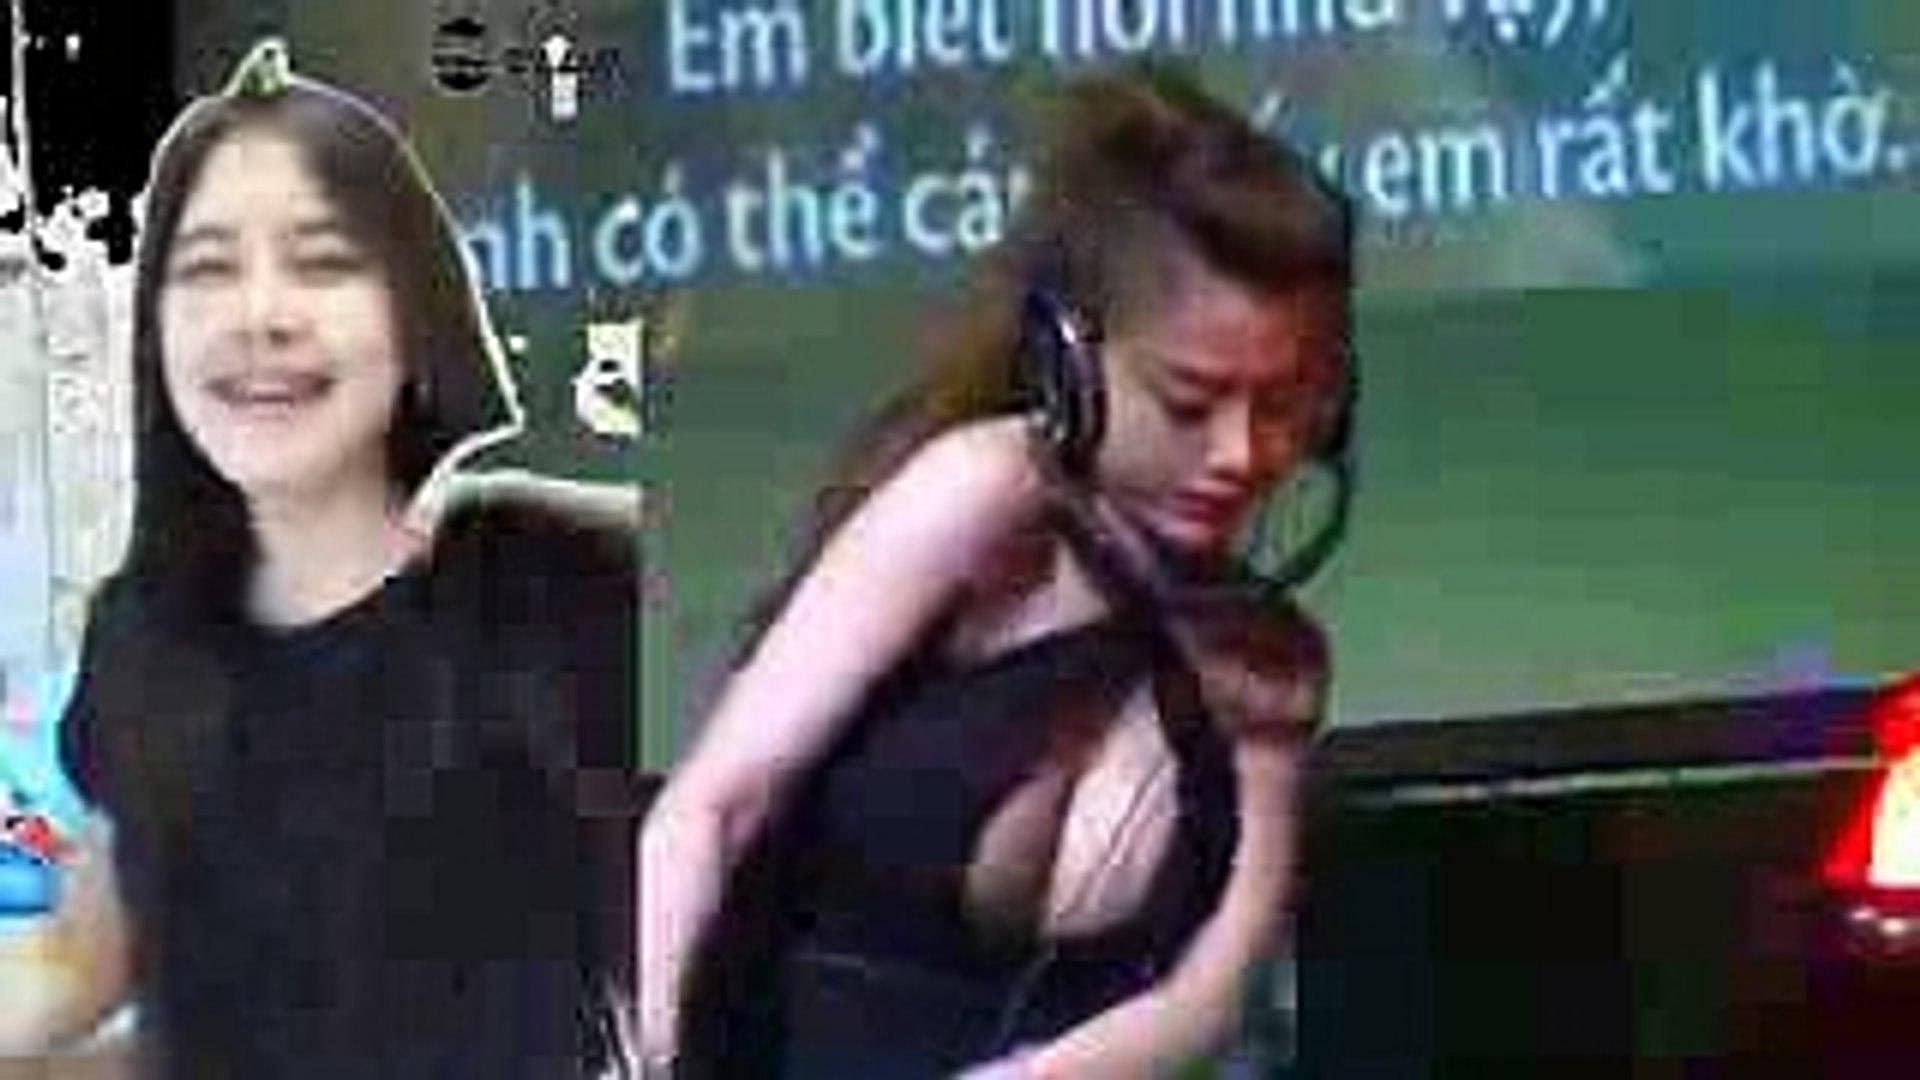 New sexy Vietnam DJ Girl vs Sexy thai girl [សិចចិន Japanese]